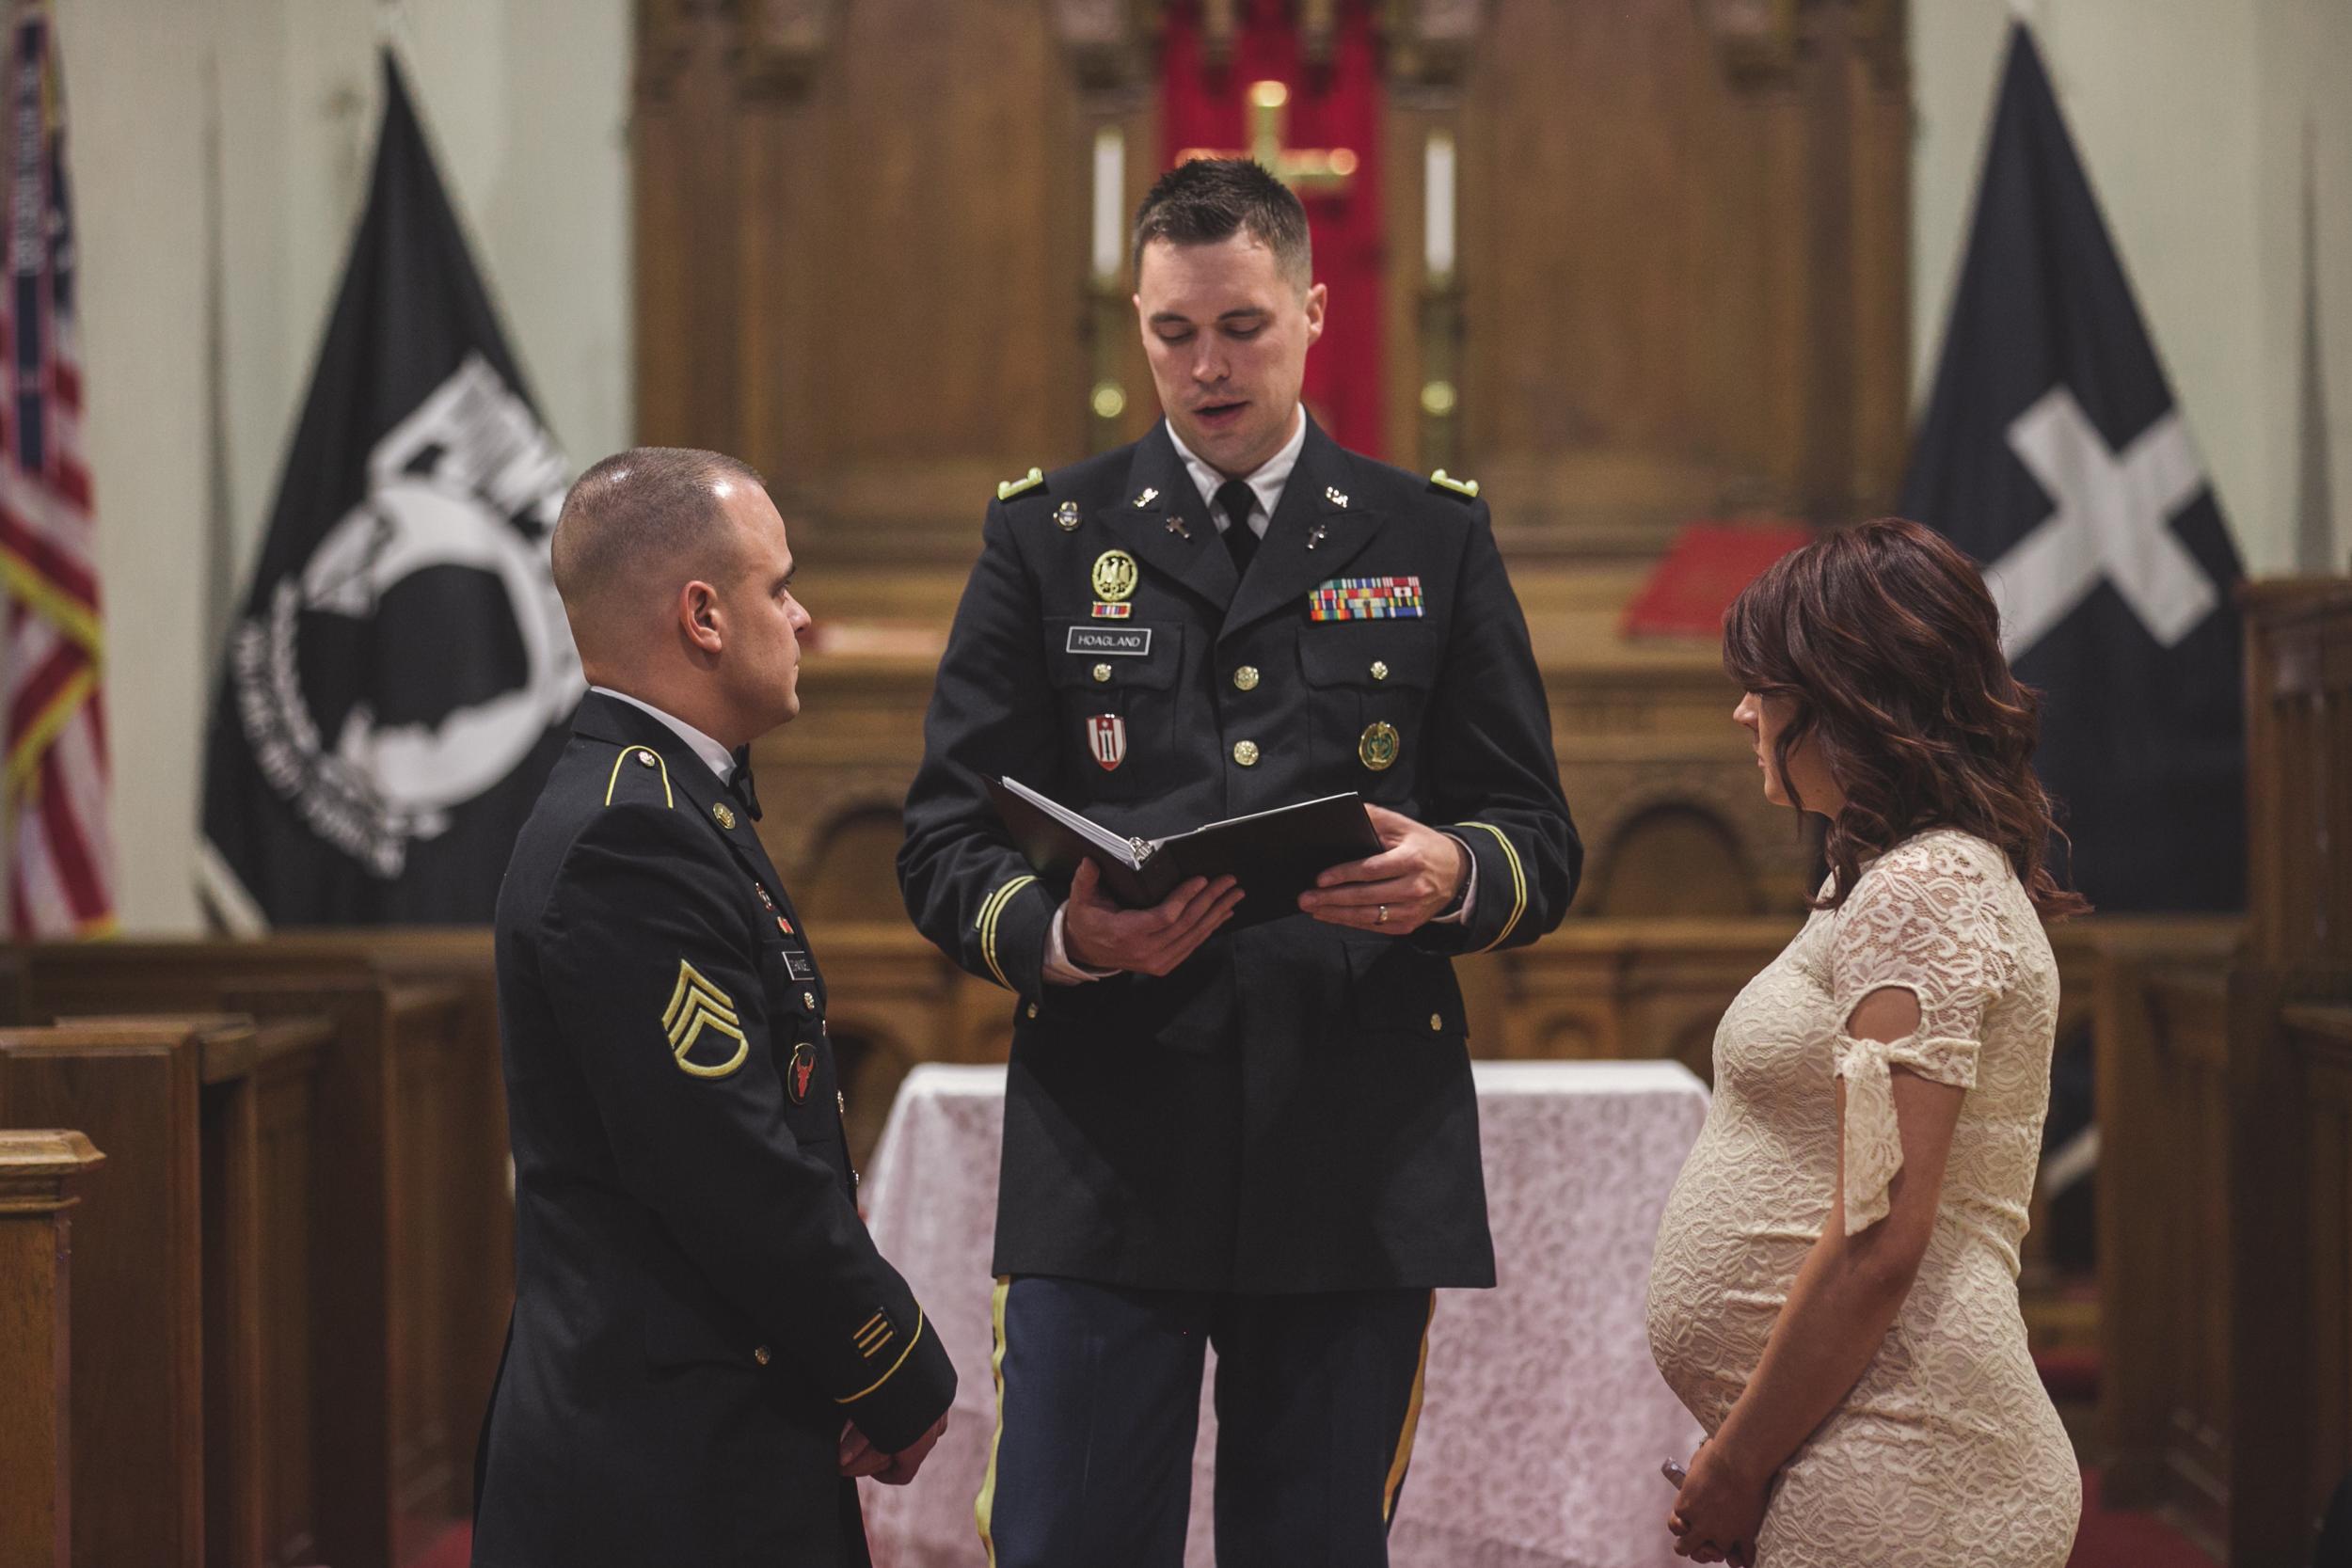 Fort Snelling Elopement St. Paul, MN, Fort Snelling Elopement, Military Elopement, Intimate Military Wedding, intimate elopement wedding-www.rachelsmak.com28.jpg